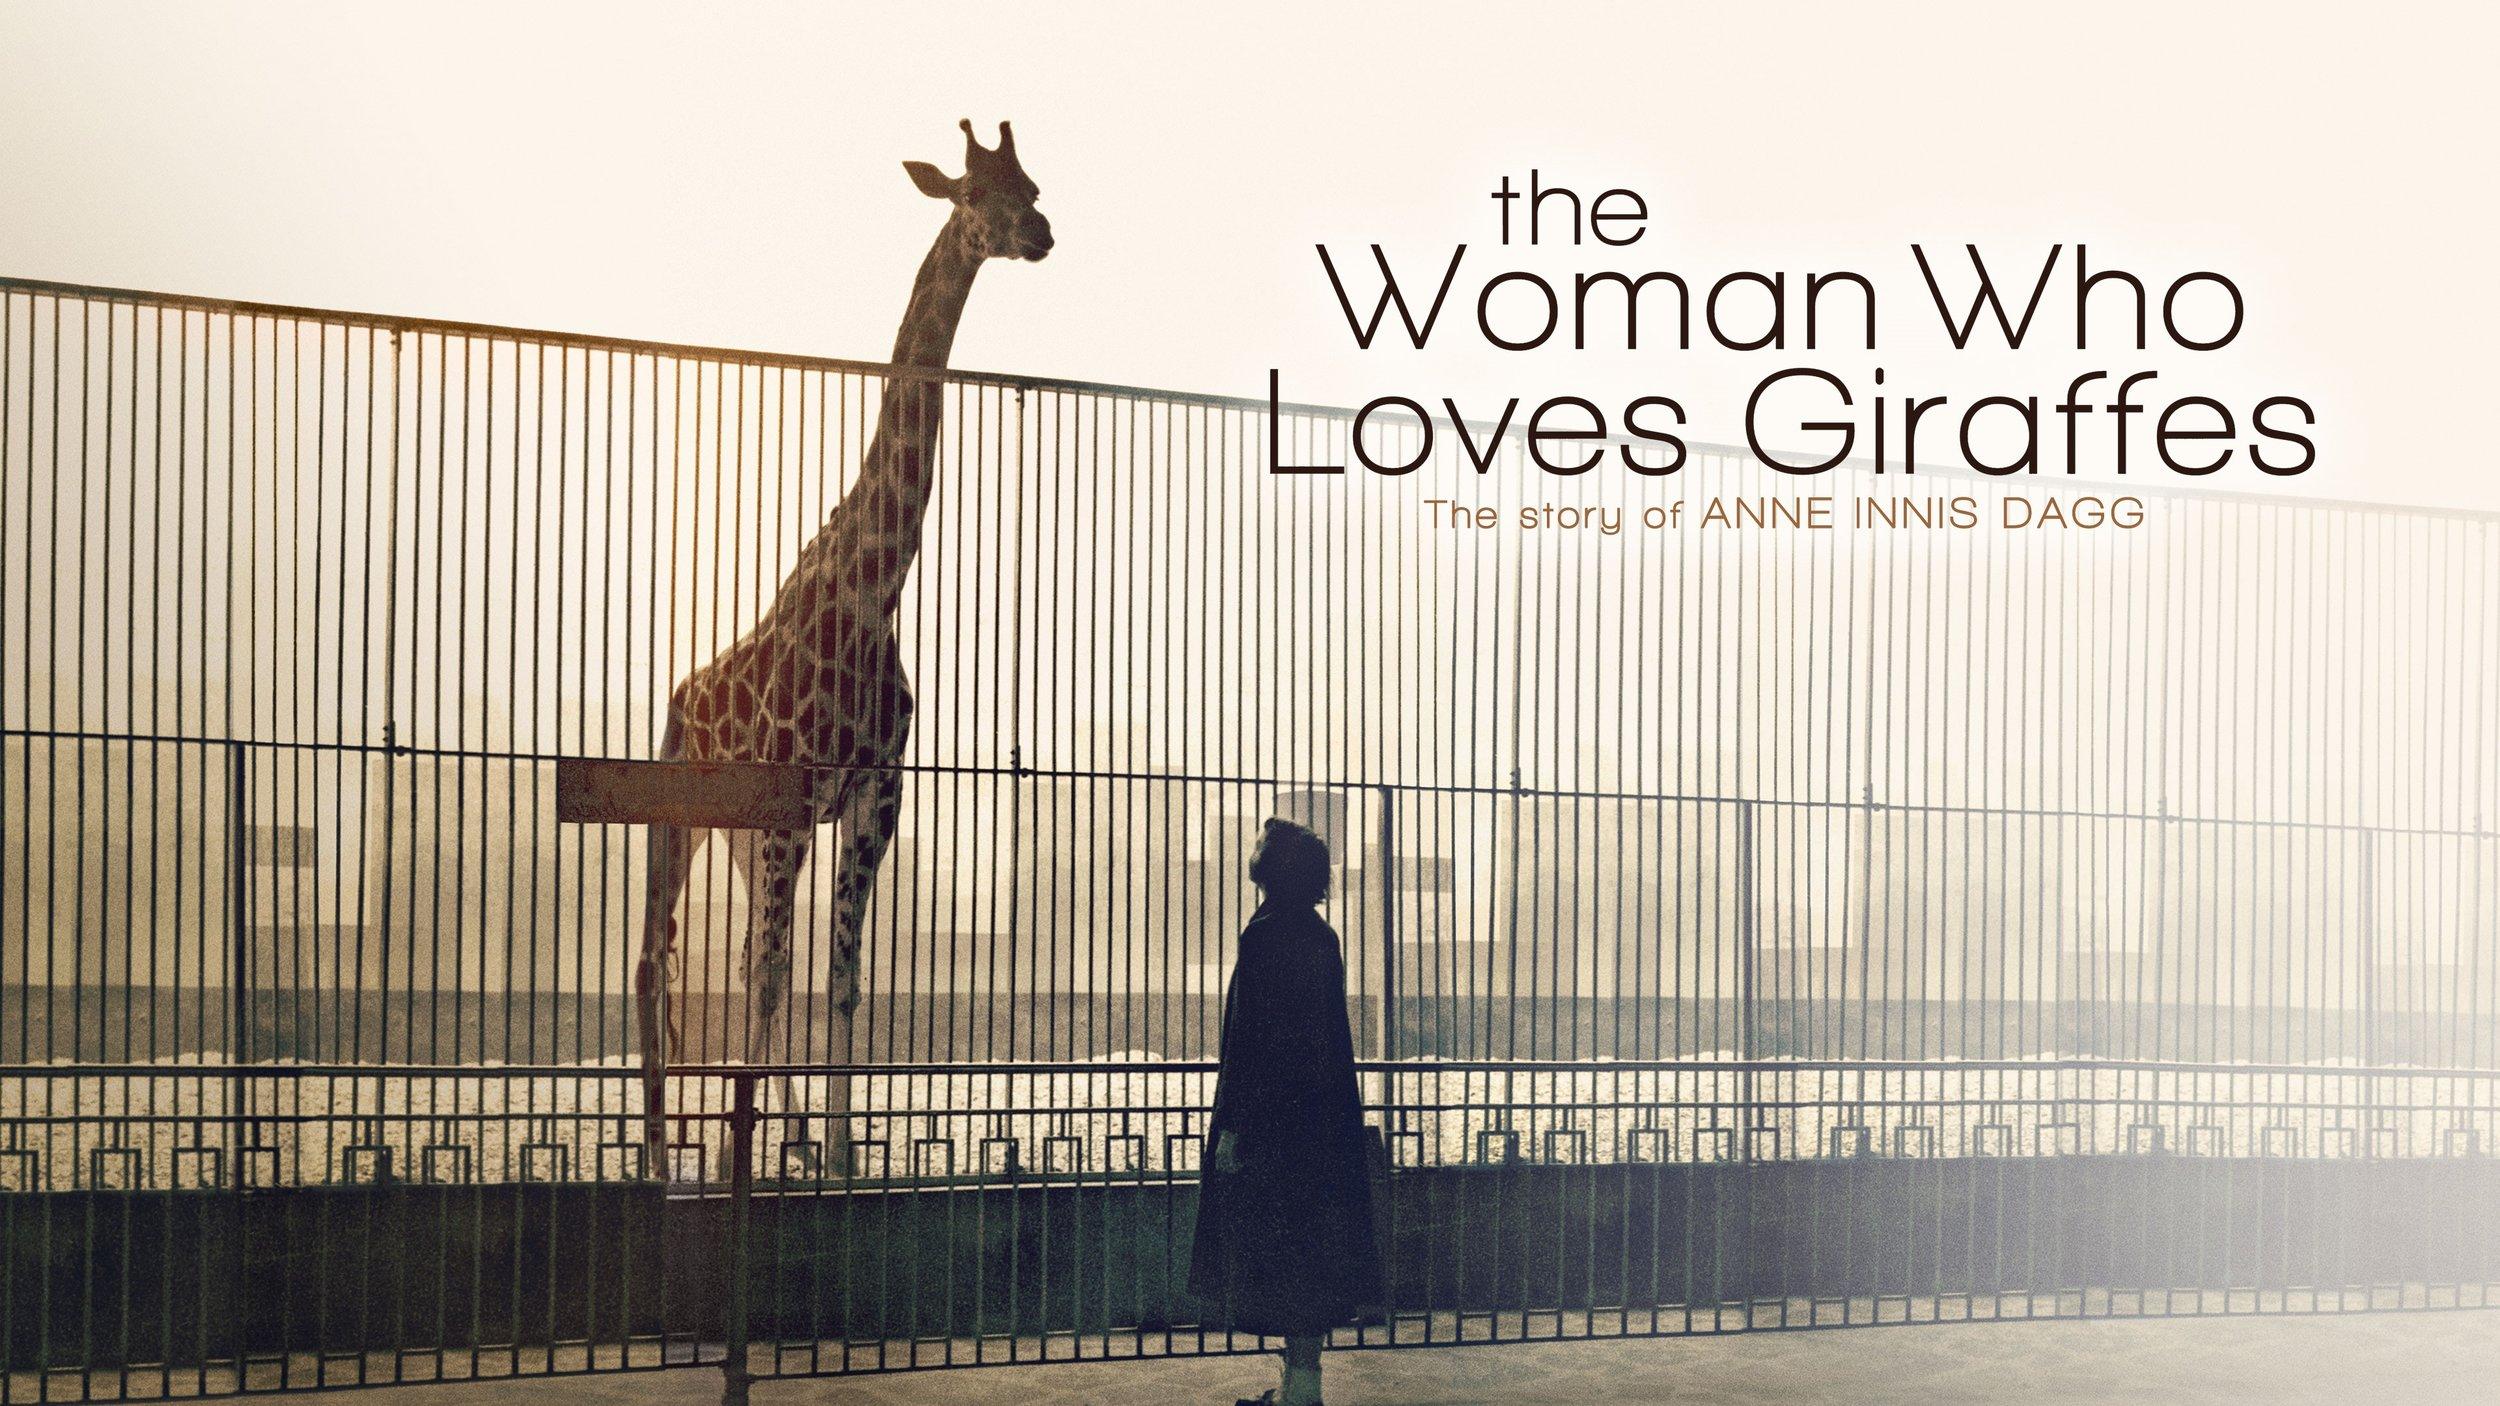 GiraffesHorizotal.jpg